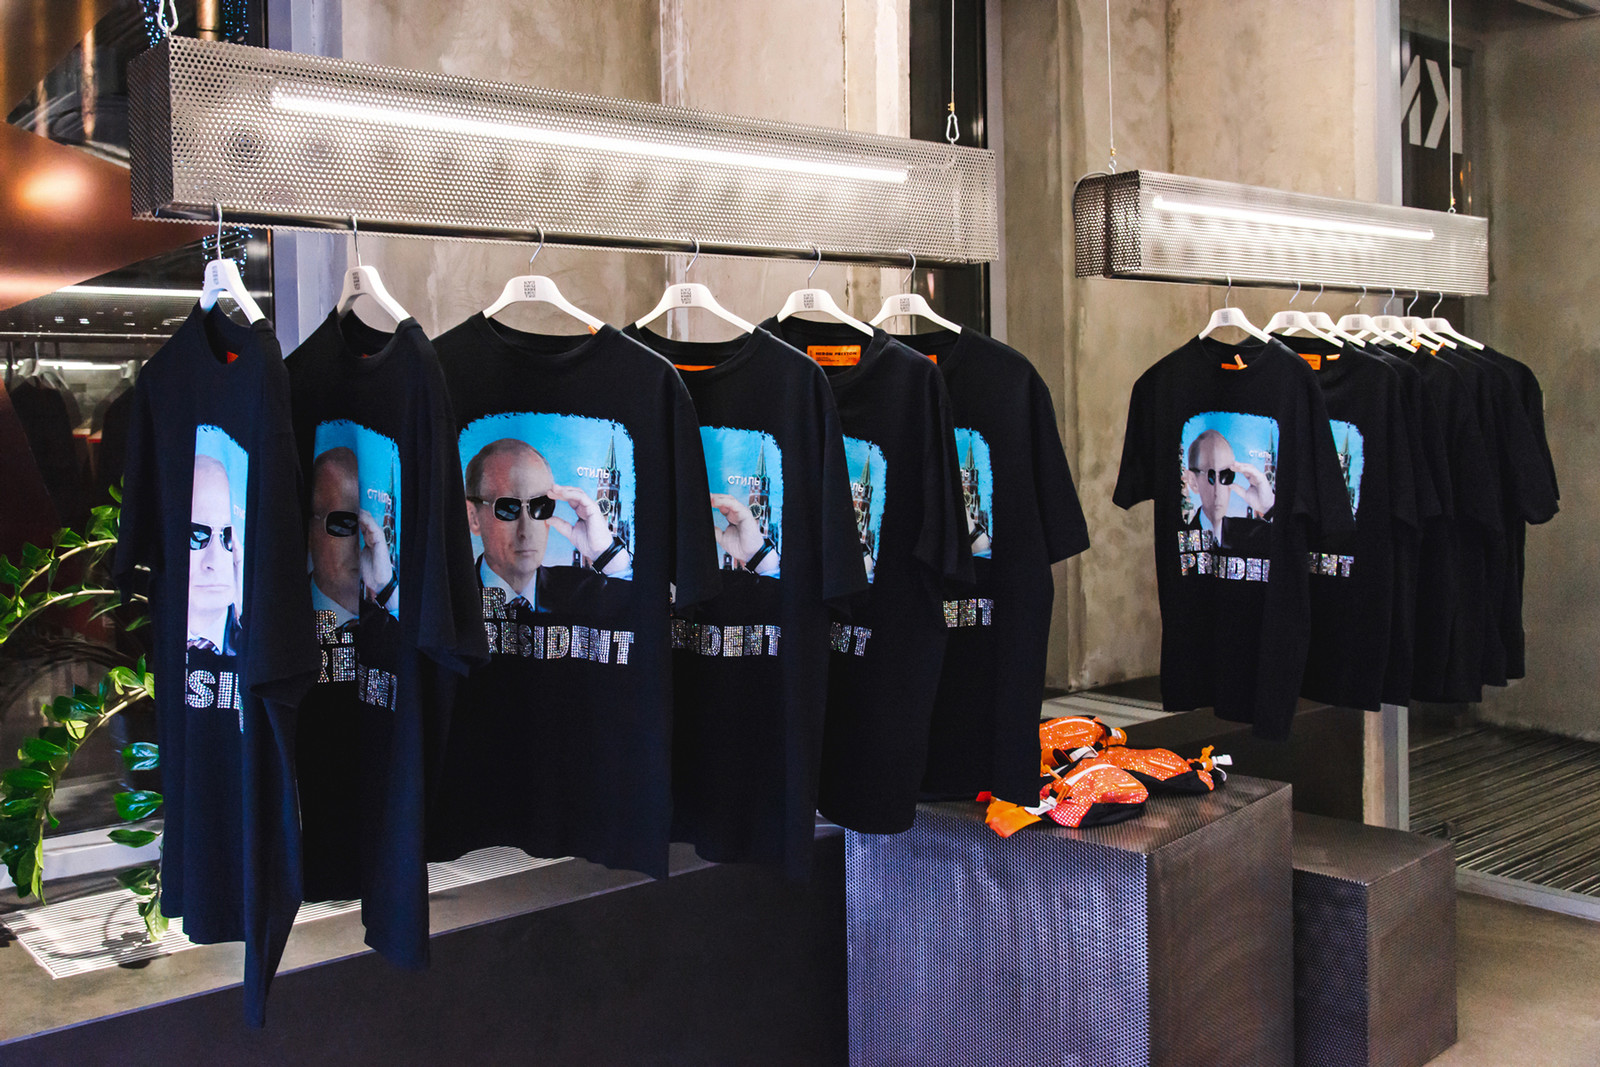 Heron Preston Olga Karput KM20 Collaboration Bejewled Fanny Pack Bag Vladimir Putin T Shirt Mr President Interview